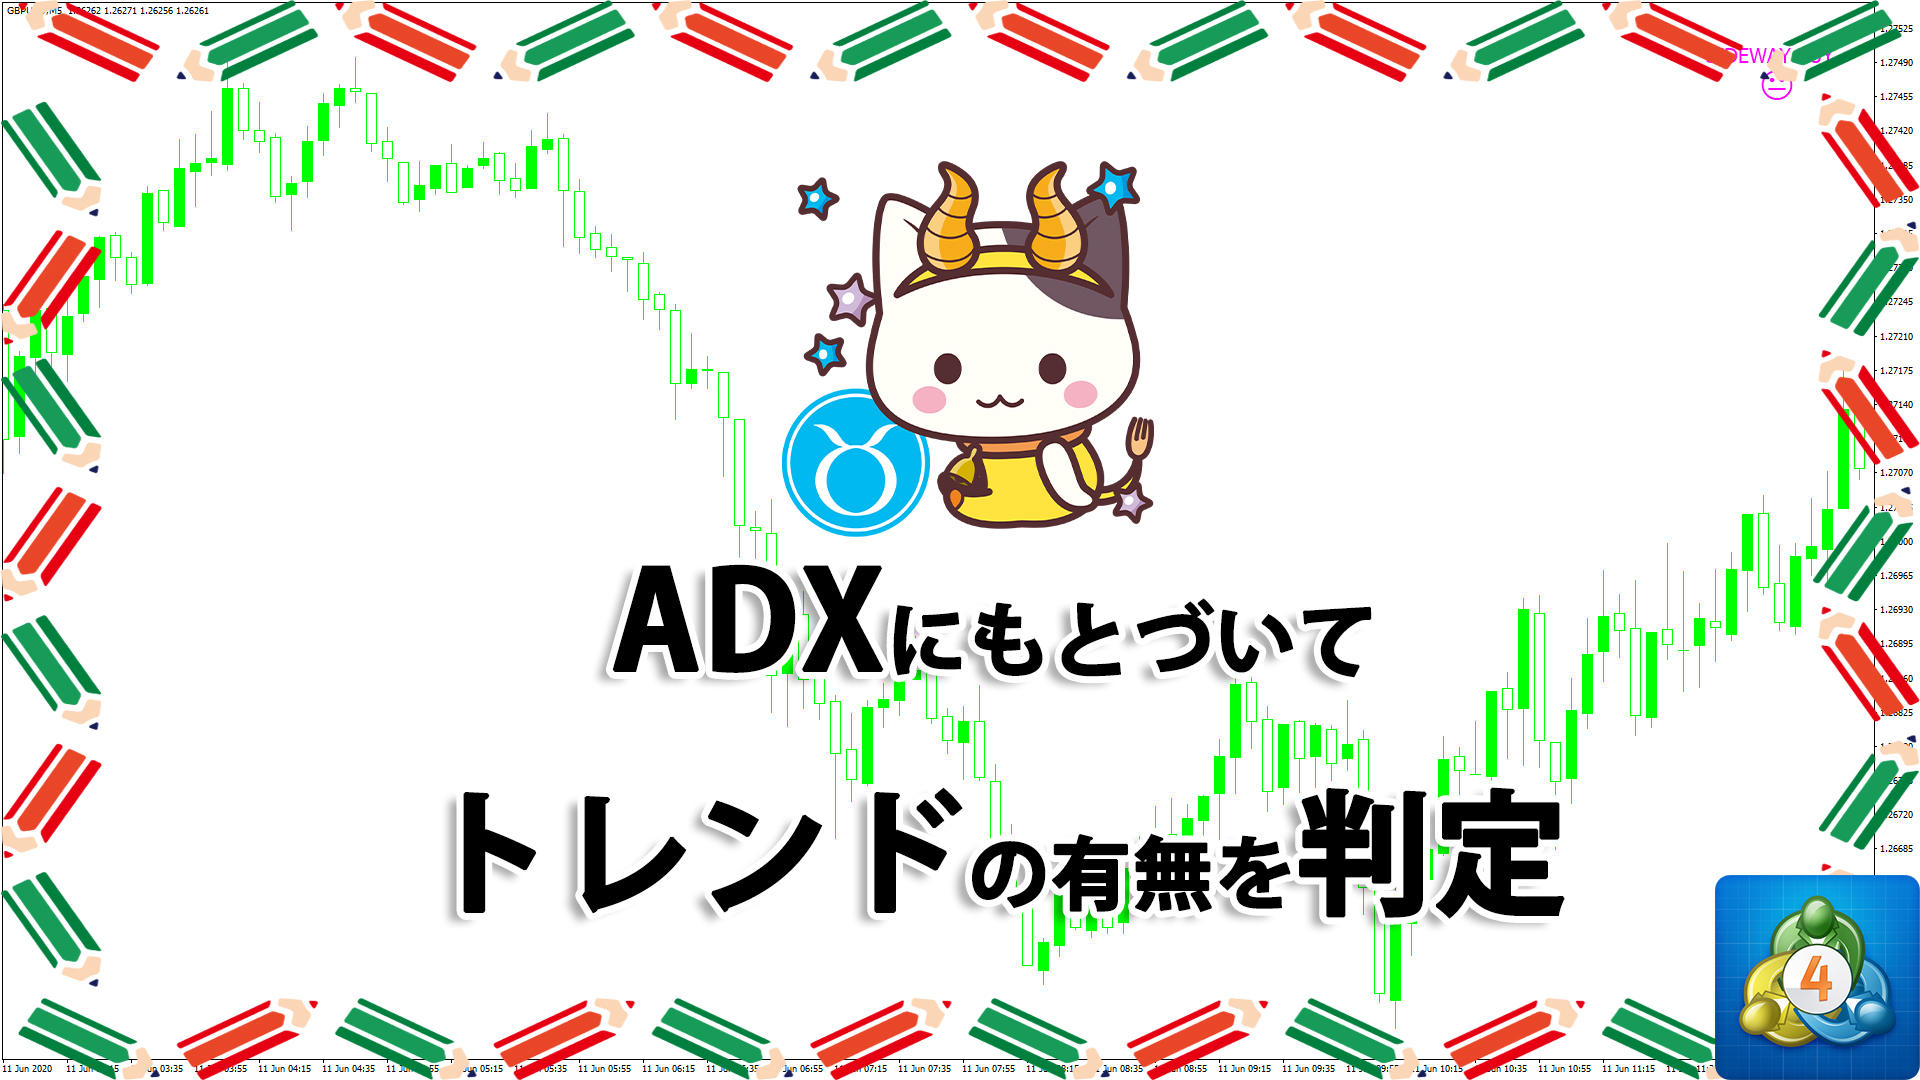 ADXにもとづいてトレンドの有無を判定するMT4インジケーターを表示する「sideway_or__trend_v_1_2_update」